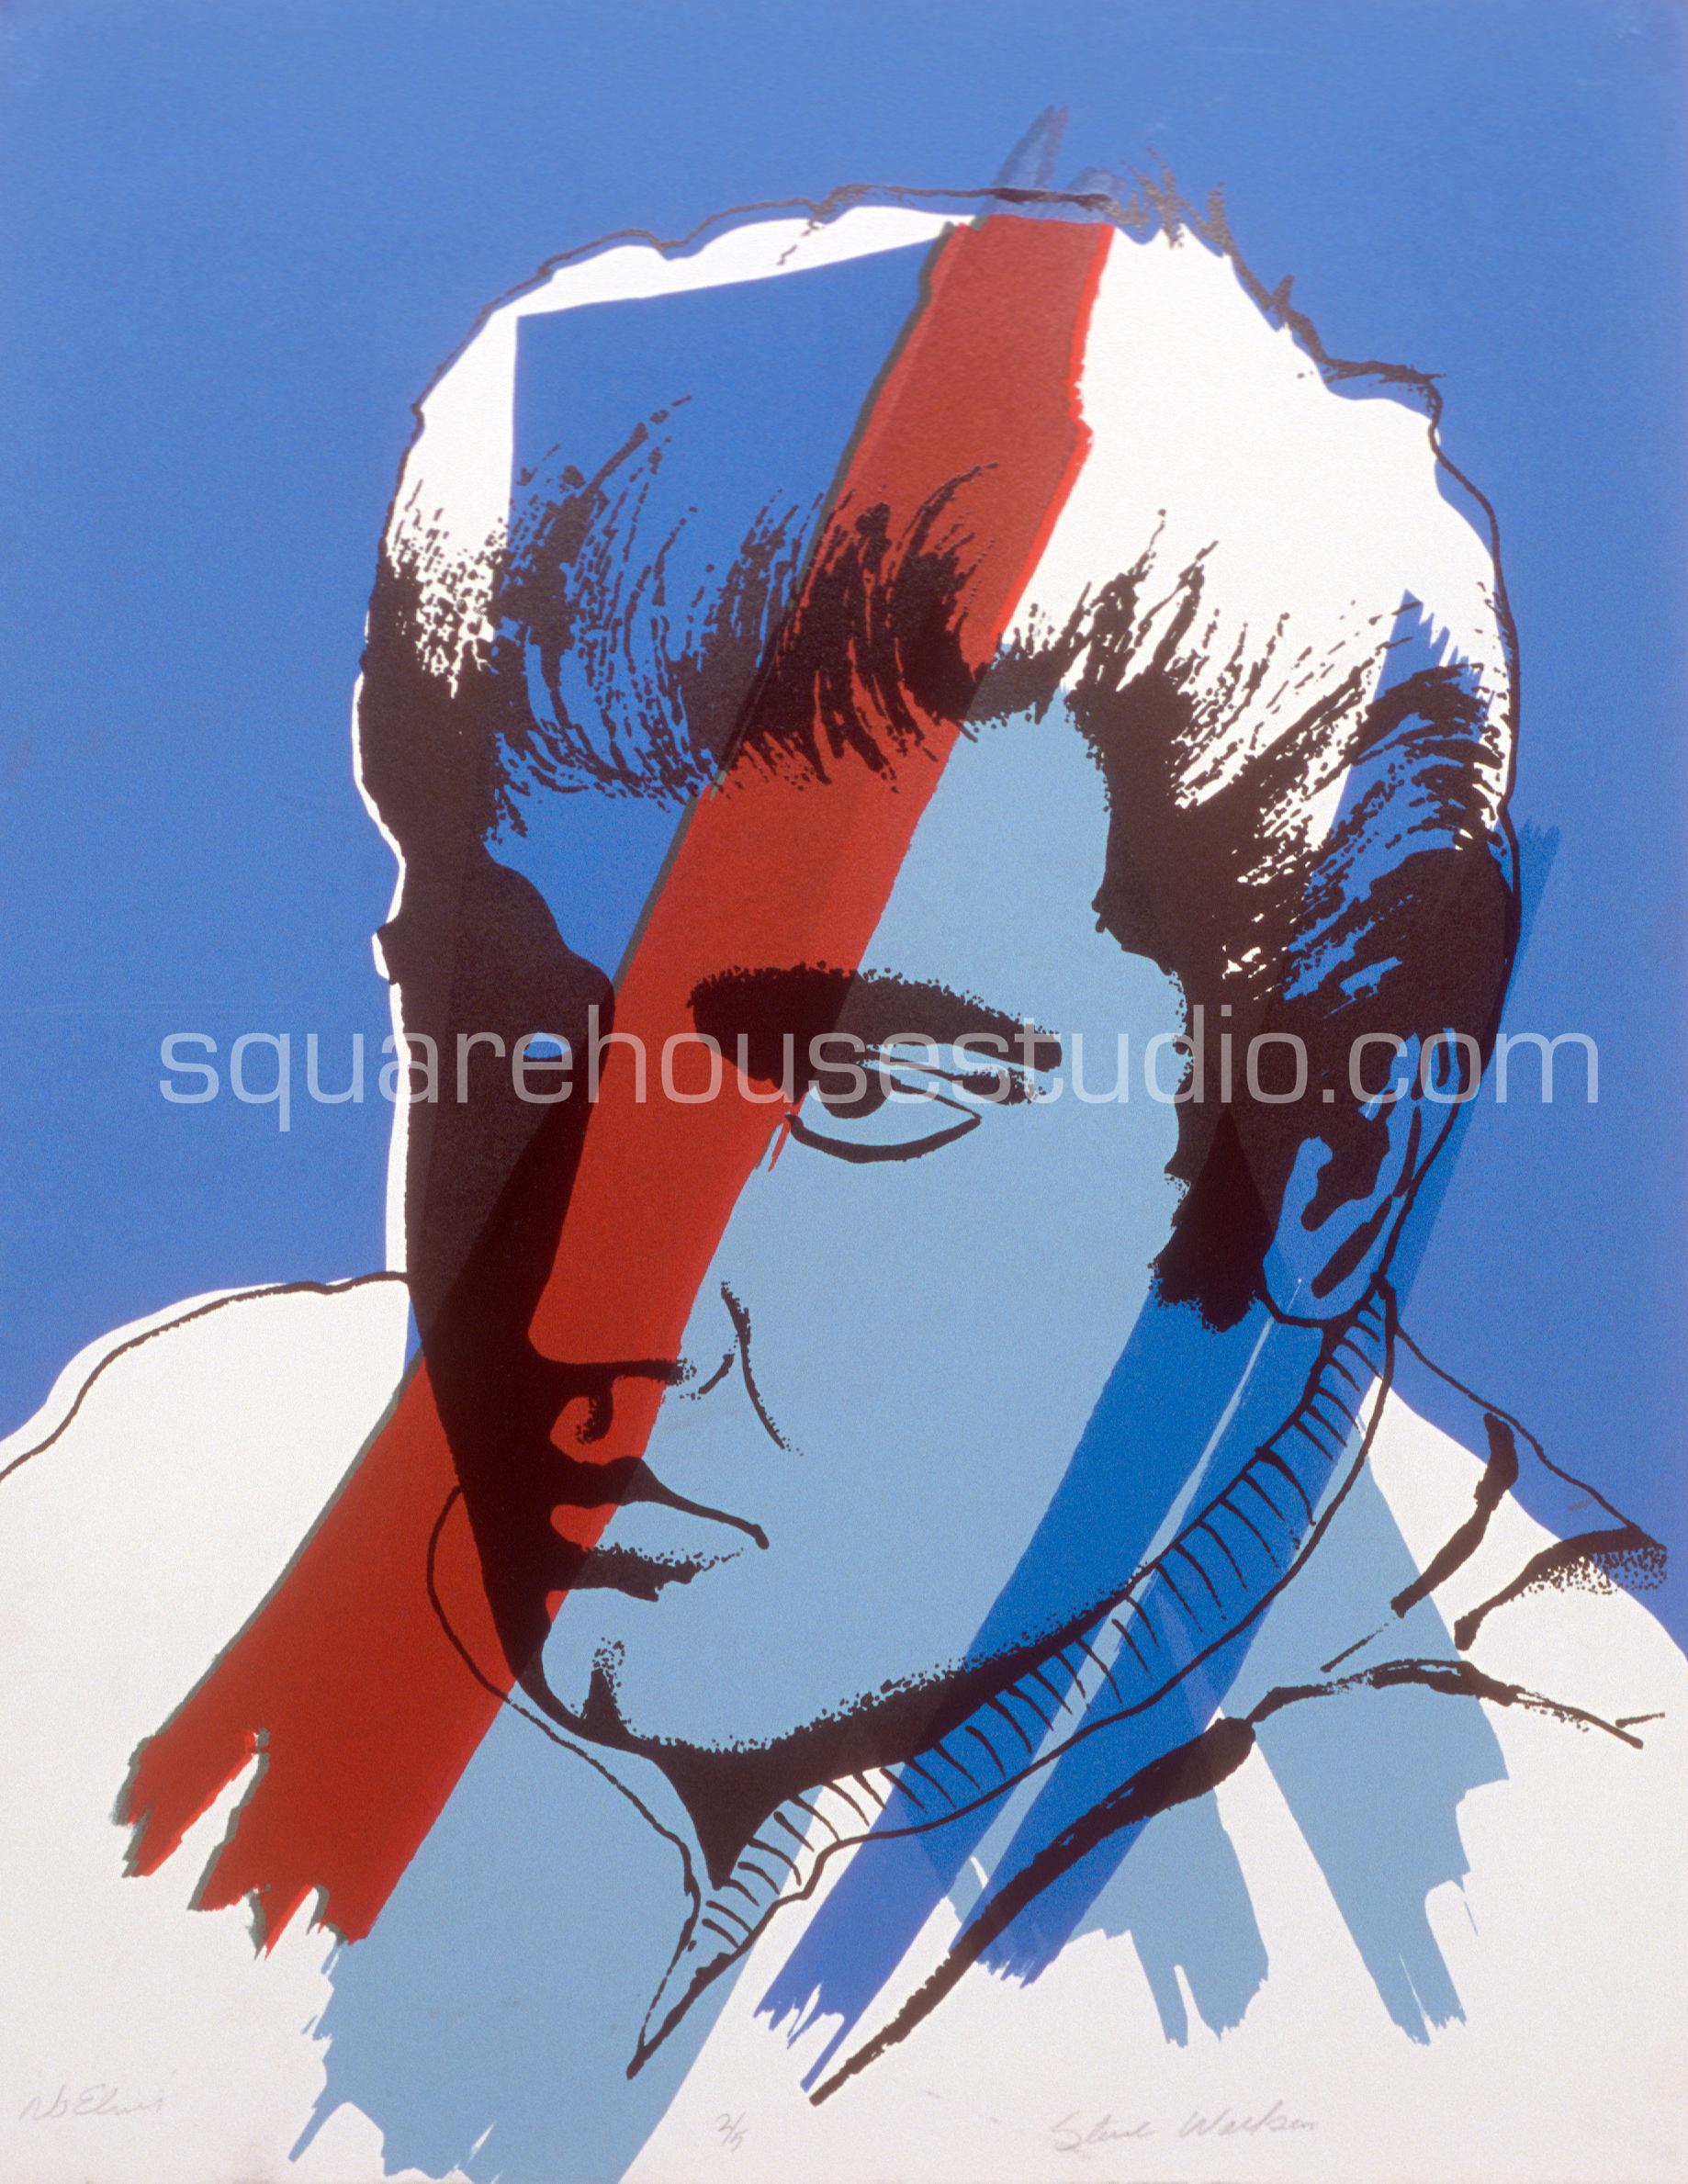 "No Elvis , 20"" x 28,"" original edition, $625 framed / $475 unframed, Available as giclée print—$450 framed / $300 unframed"